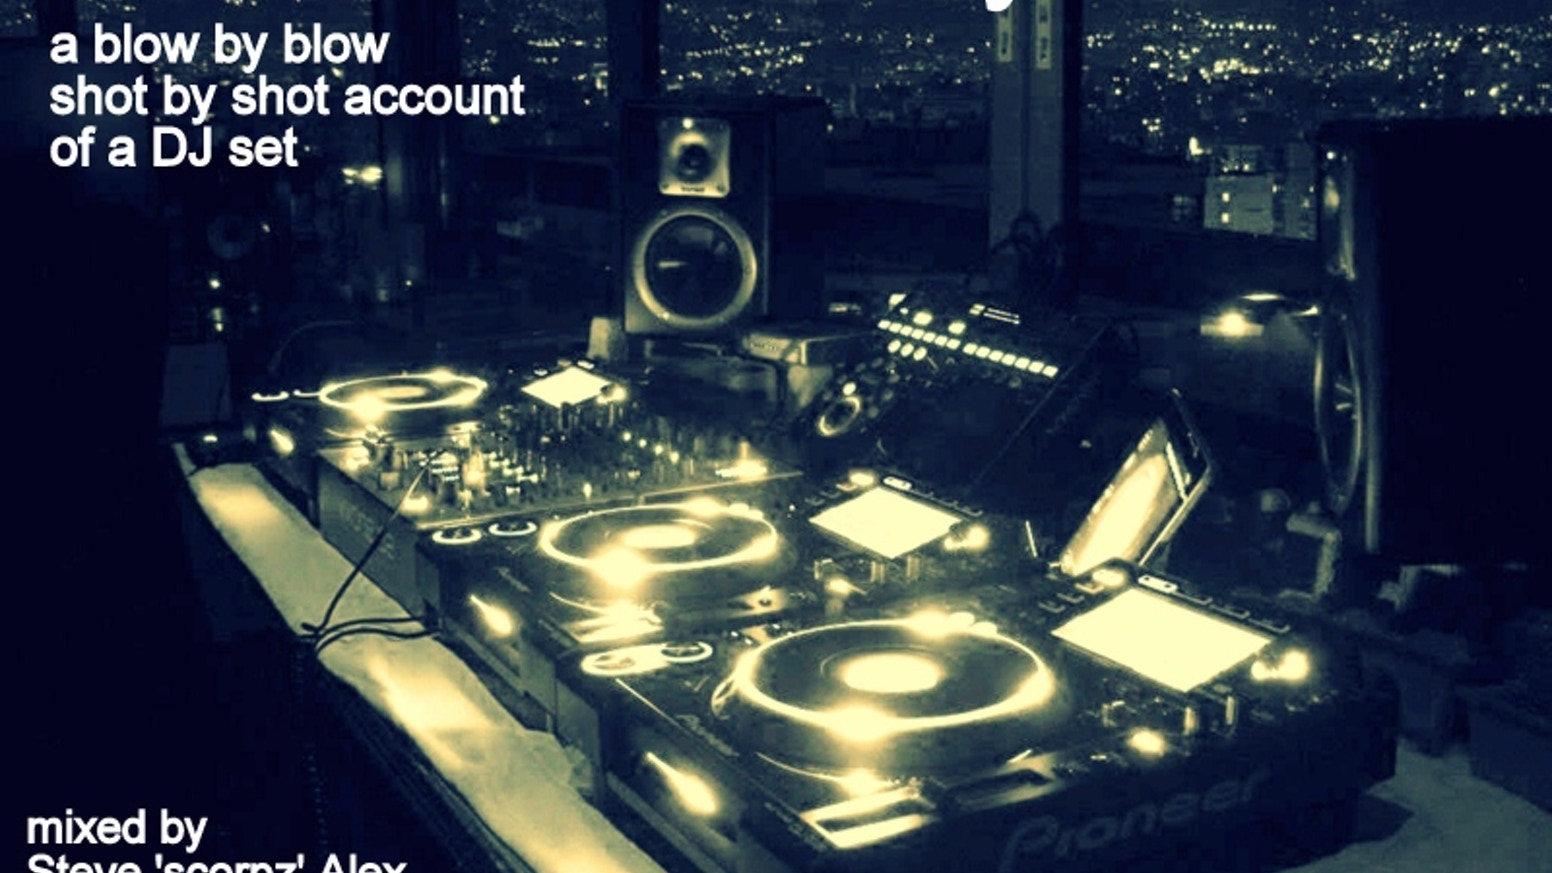 LET THE MUSIC PLAY!' by Steve 'scorpz 'Alex — Kickstarter